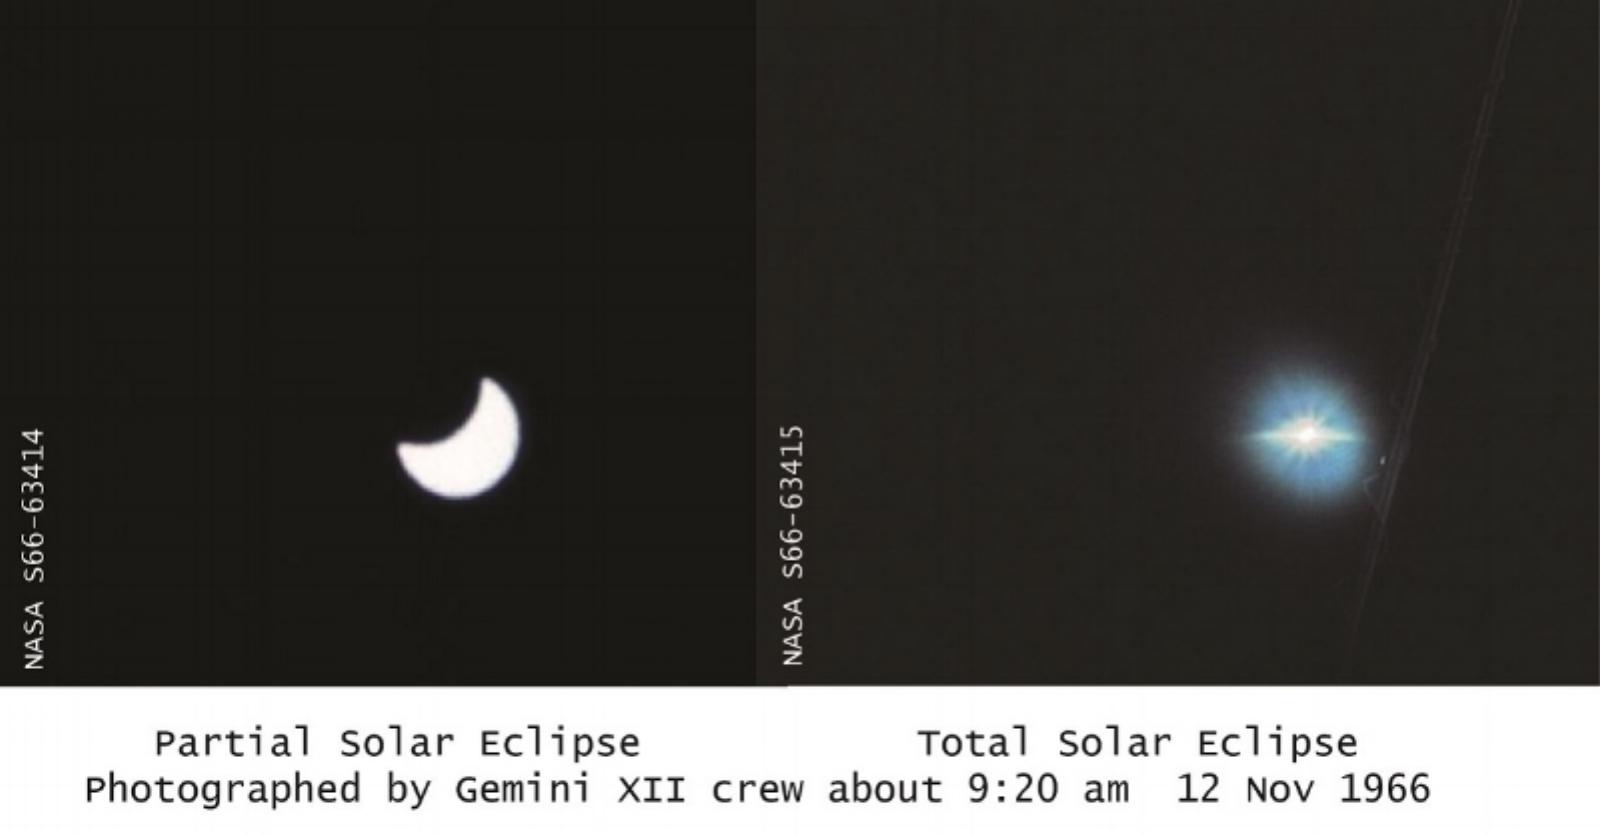 1916-12-11 Solar Eclipse Gemini XII.jpg